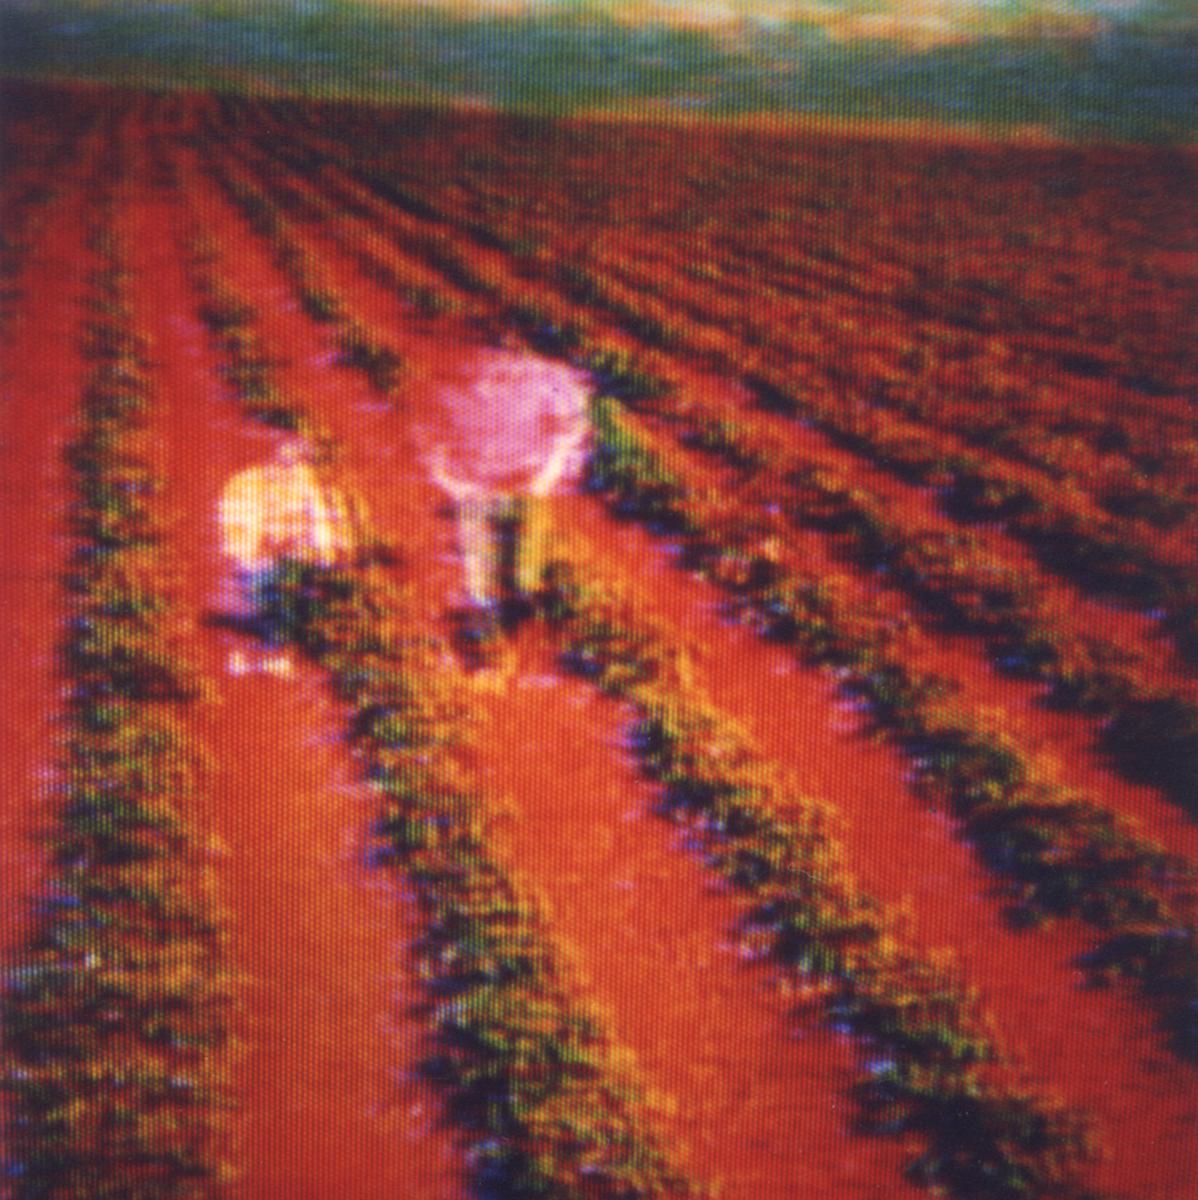 Television-TV-Polaroid-SX70-Surreal-Farm.jpg